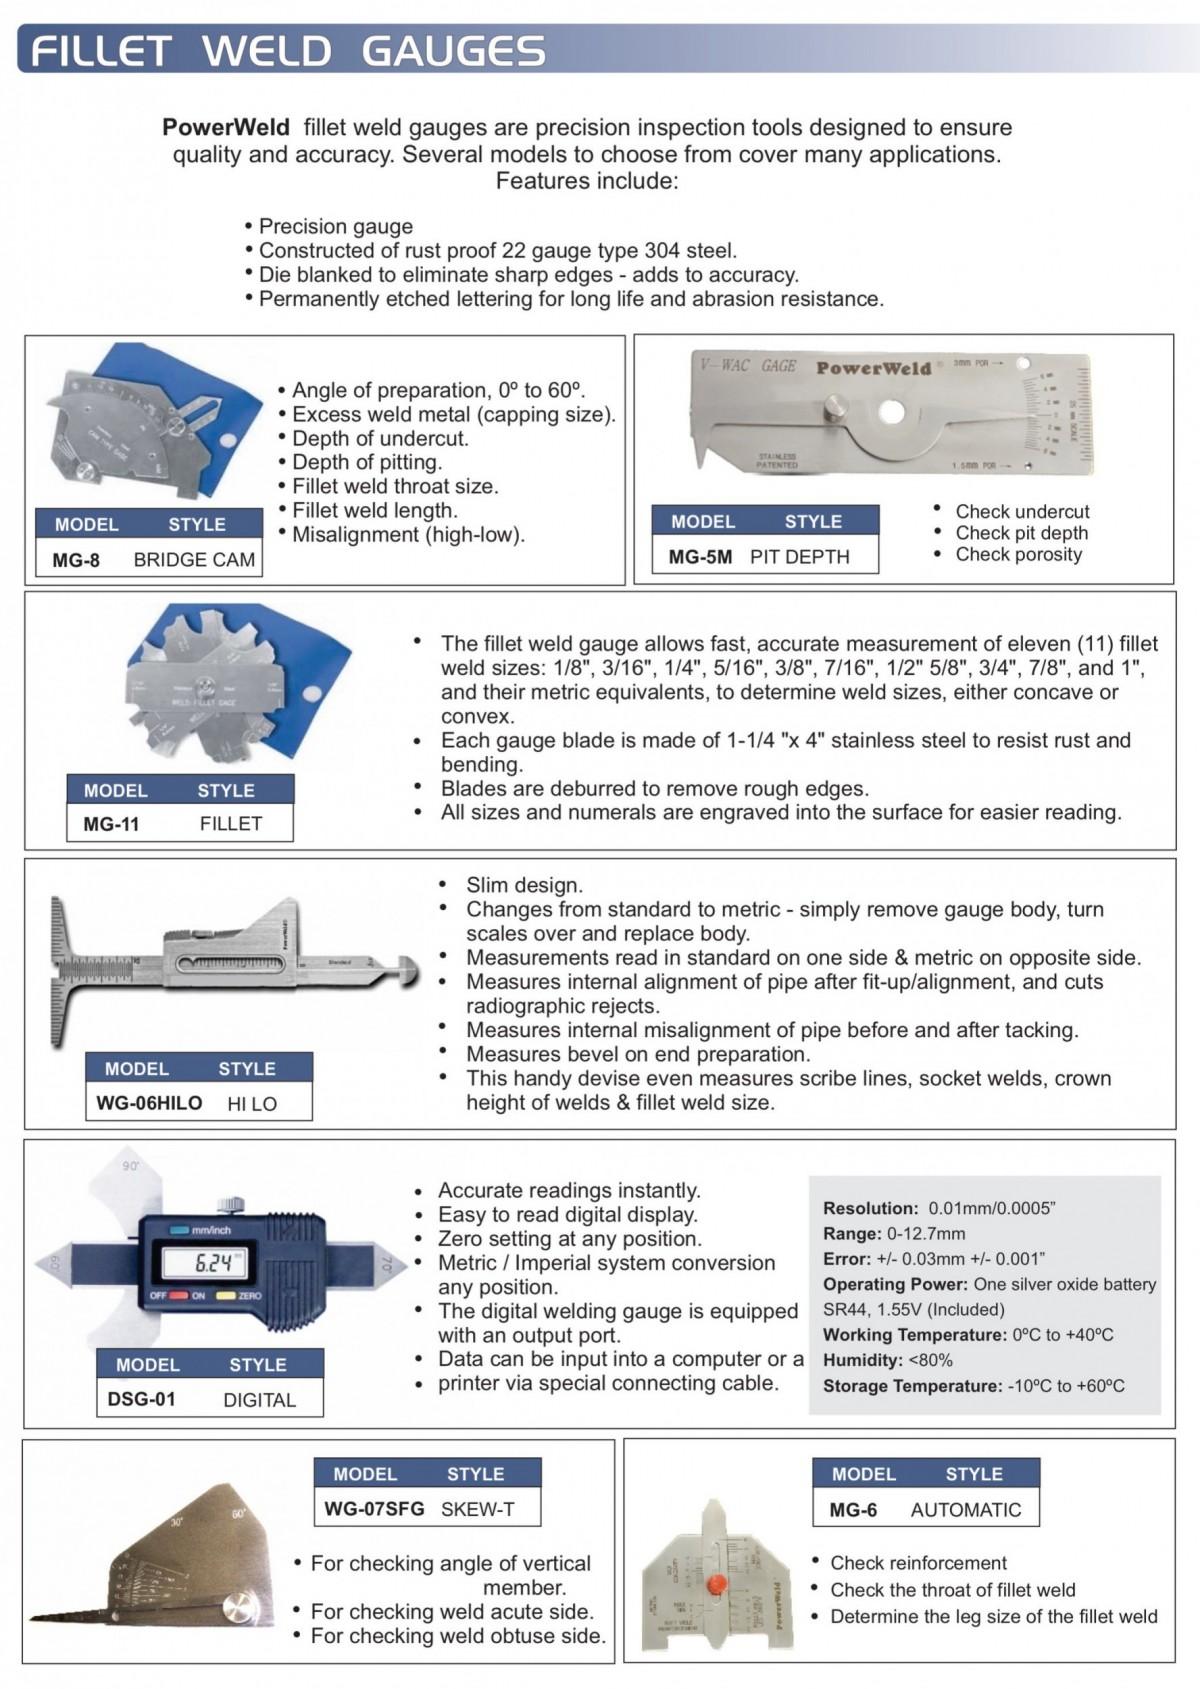 Powerweld Inc Miscellaneous Products Fillet Weld Gauges